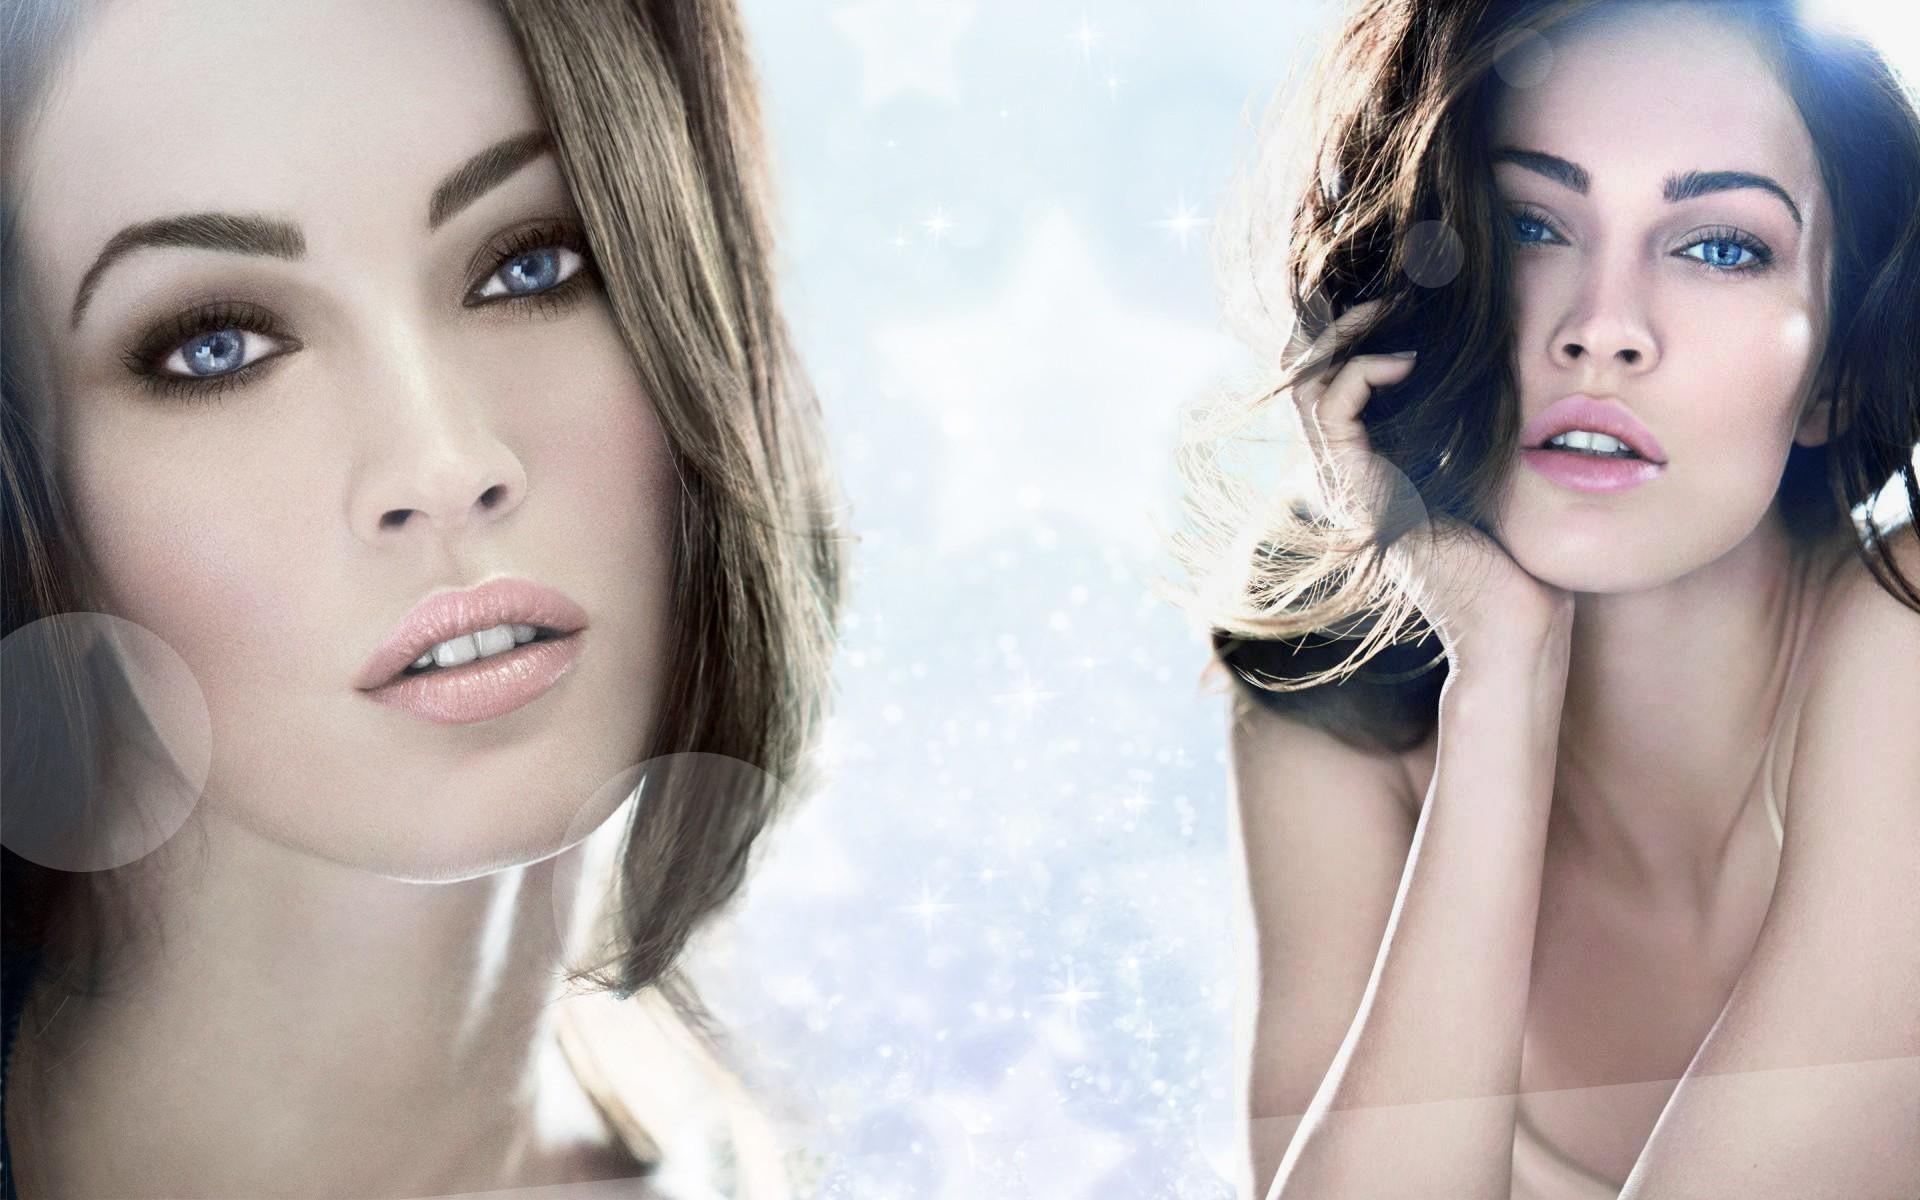 glamorous woman 4k hd desktop wallpaper for 4k ultra hd tv - HD1920×1200